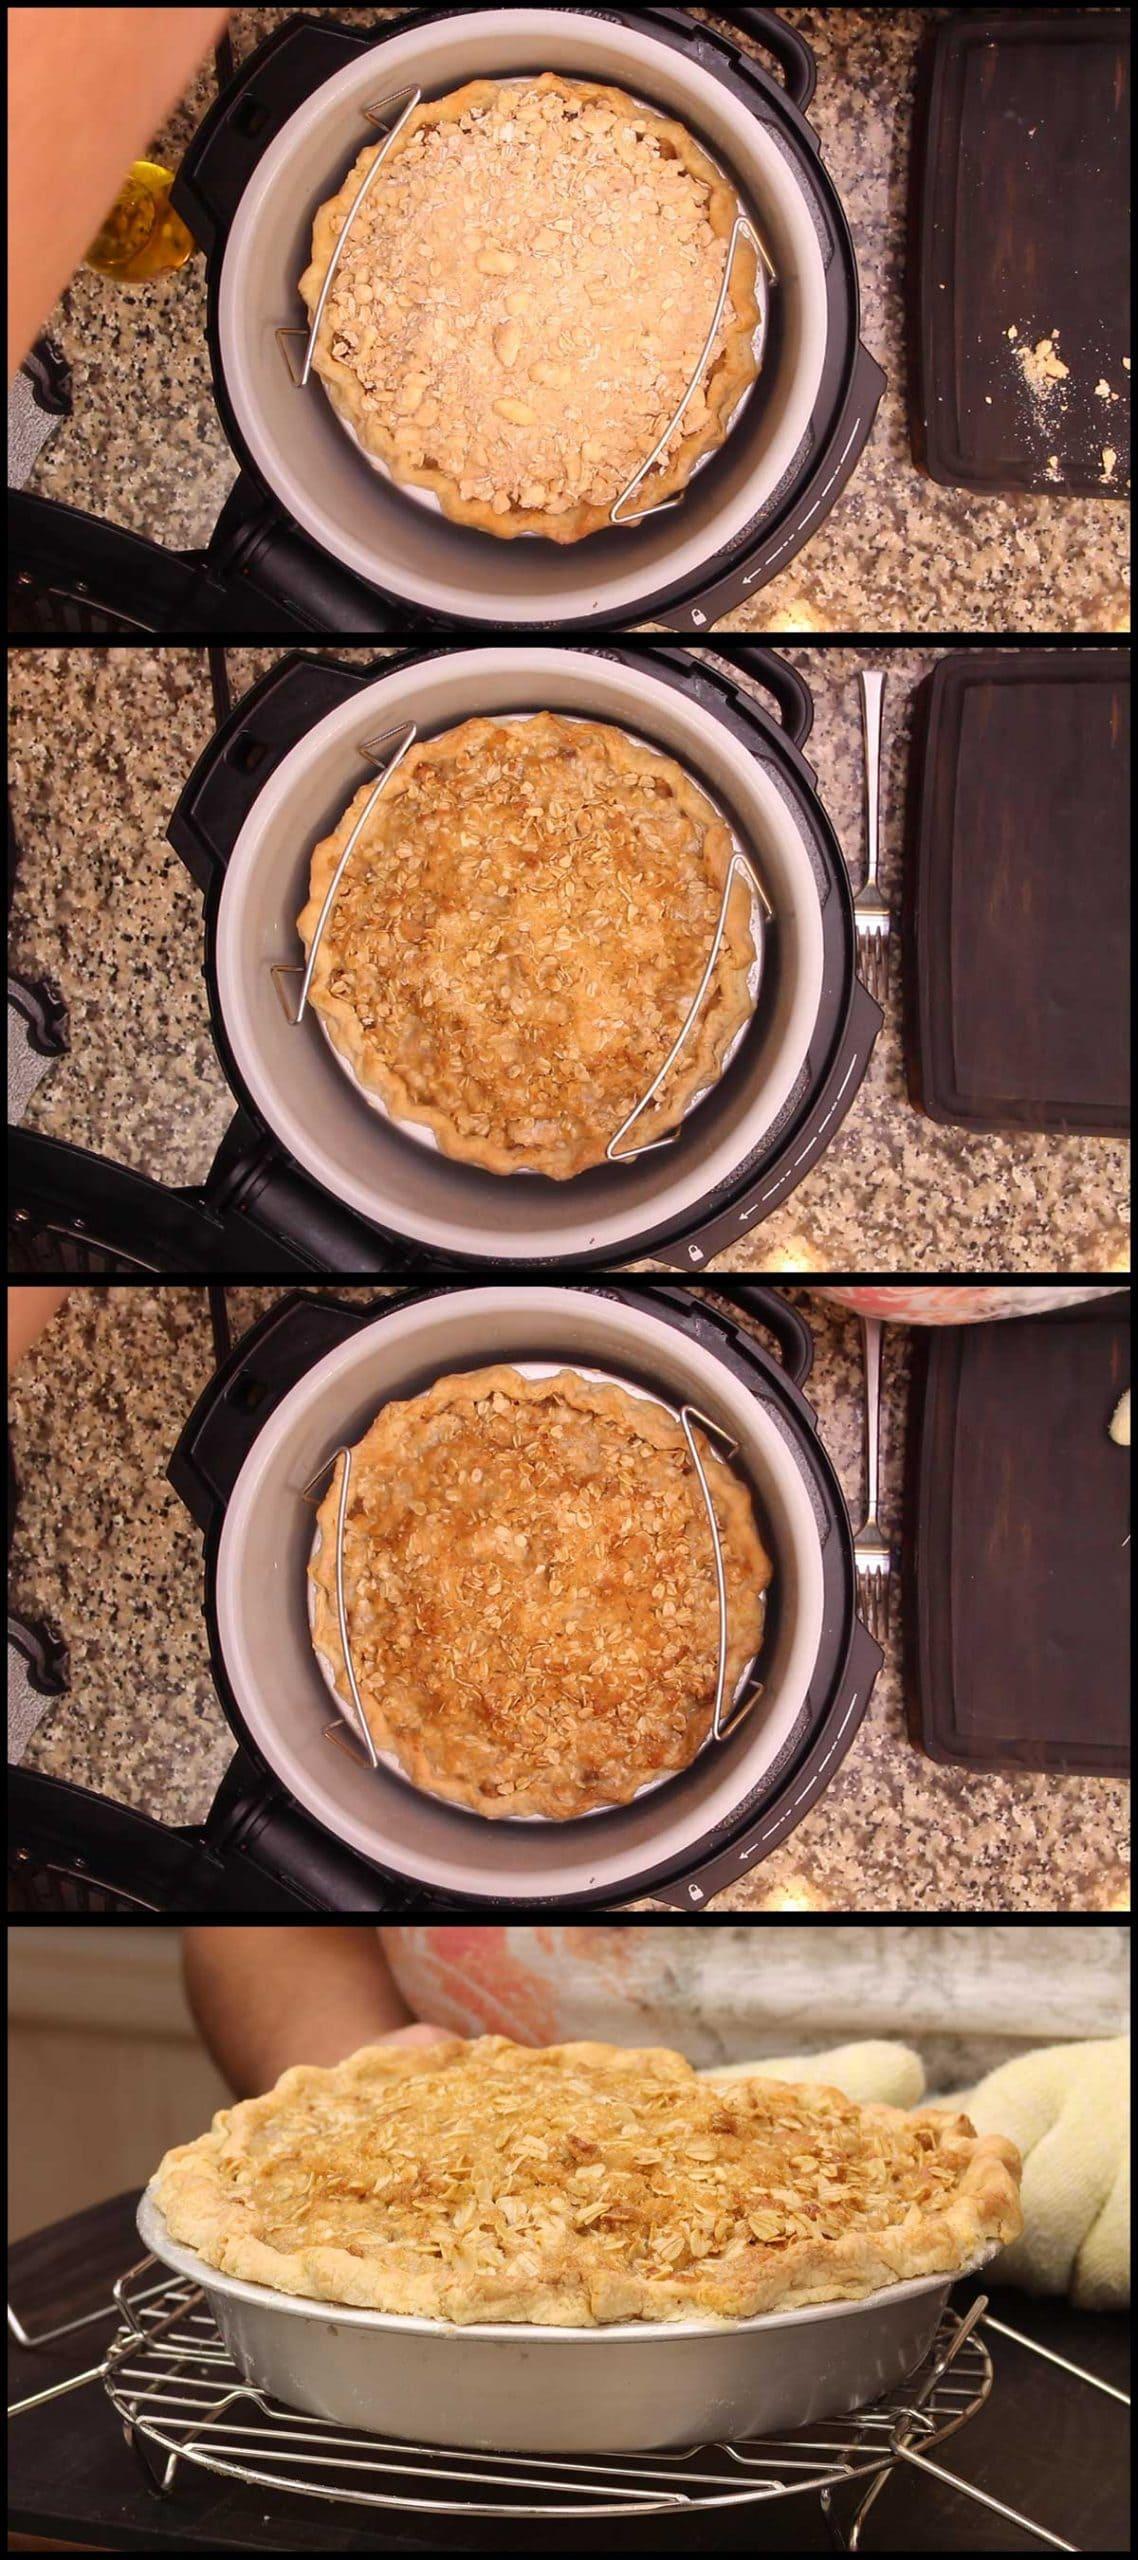 Baking the 10-minute apple pie